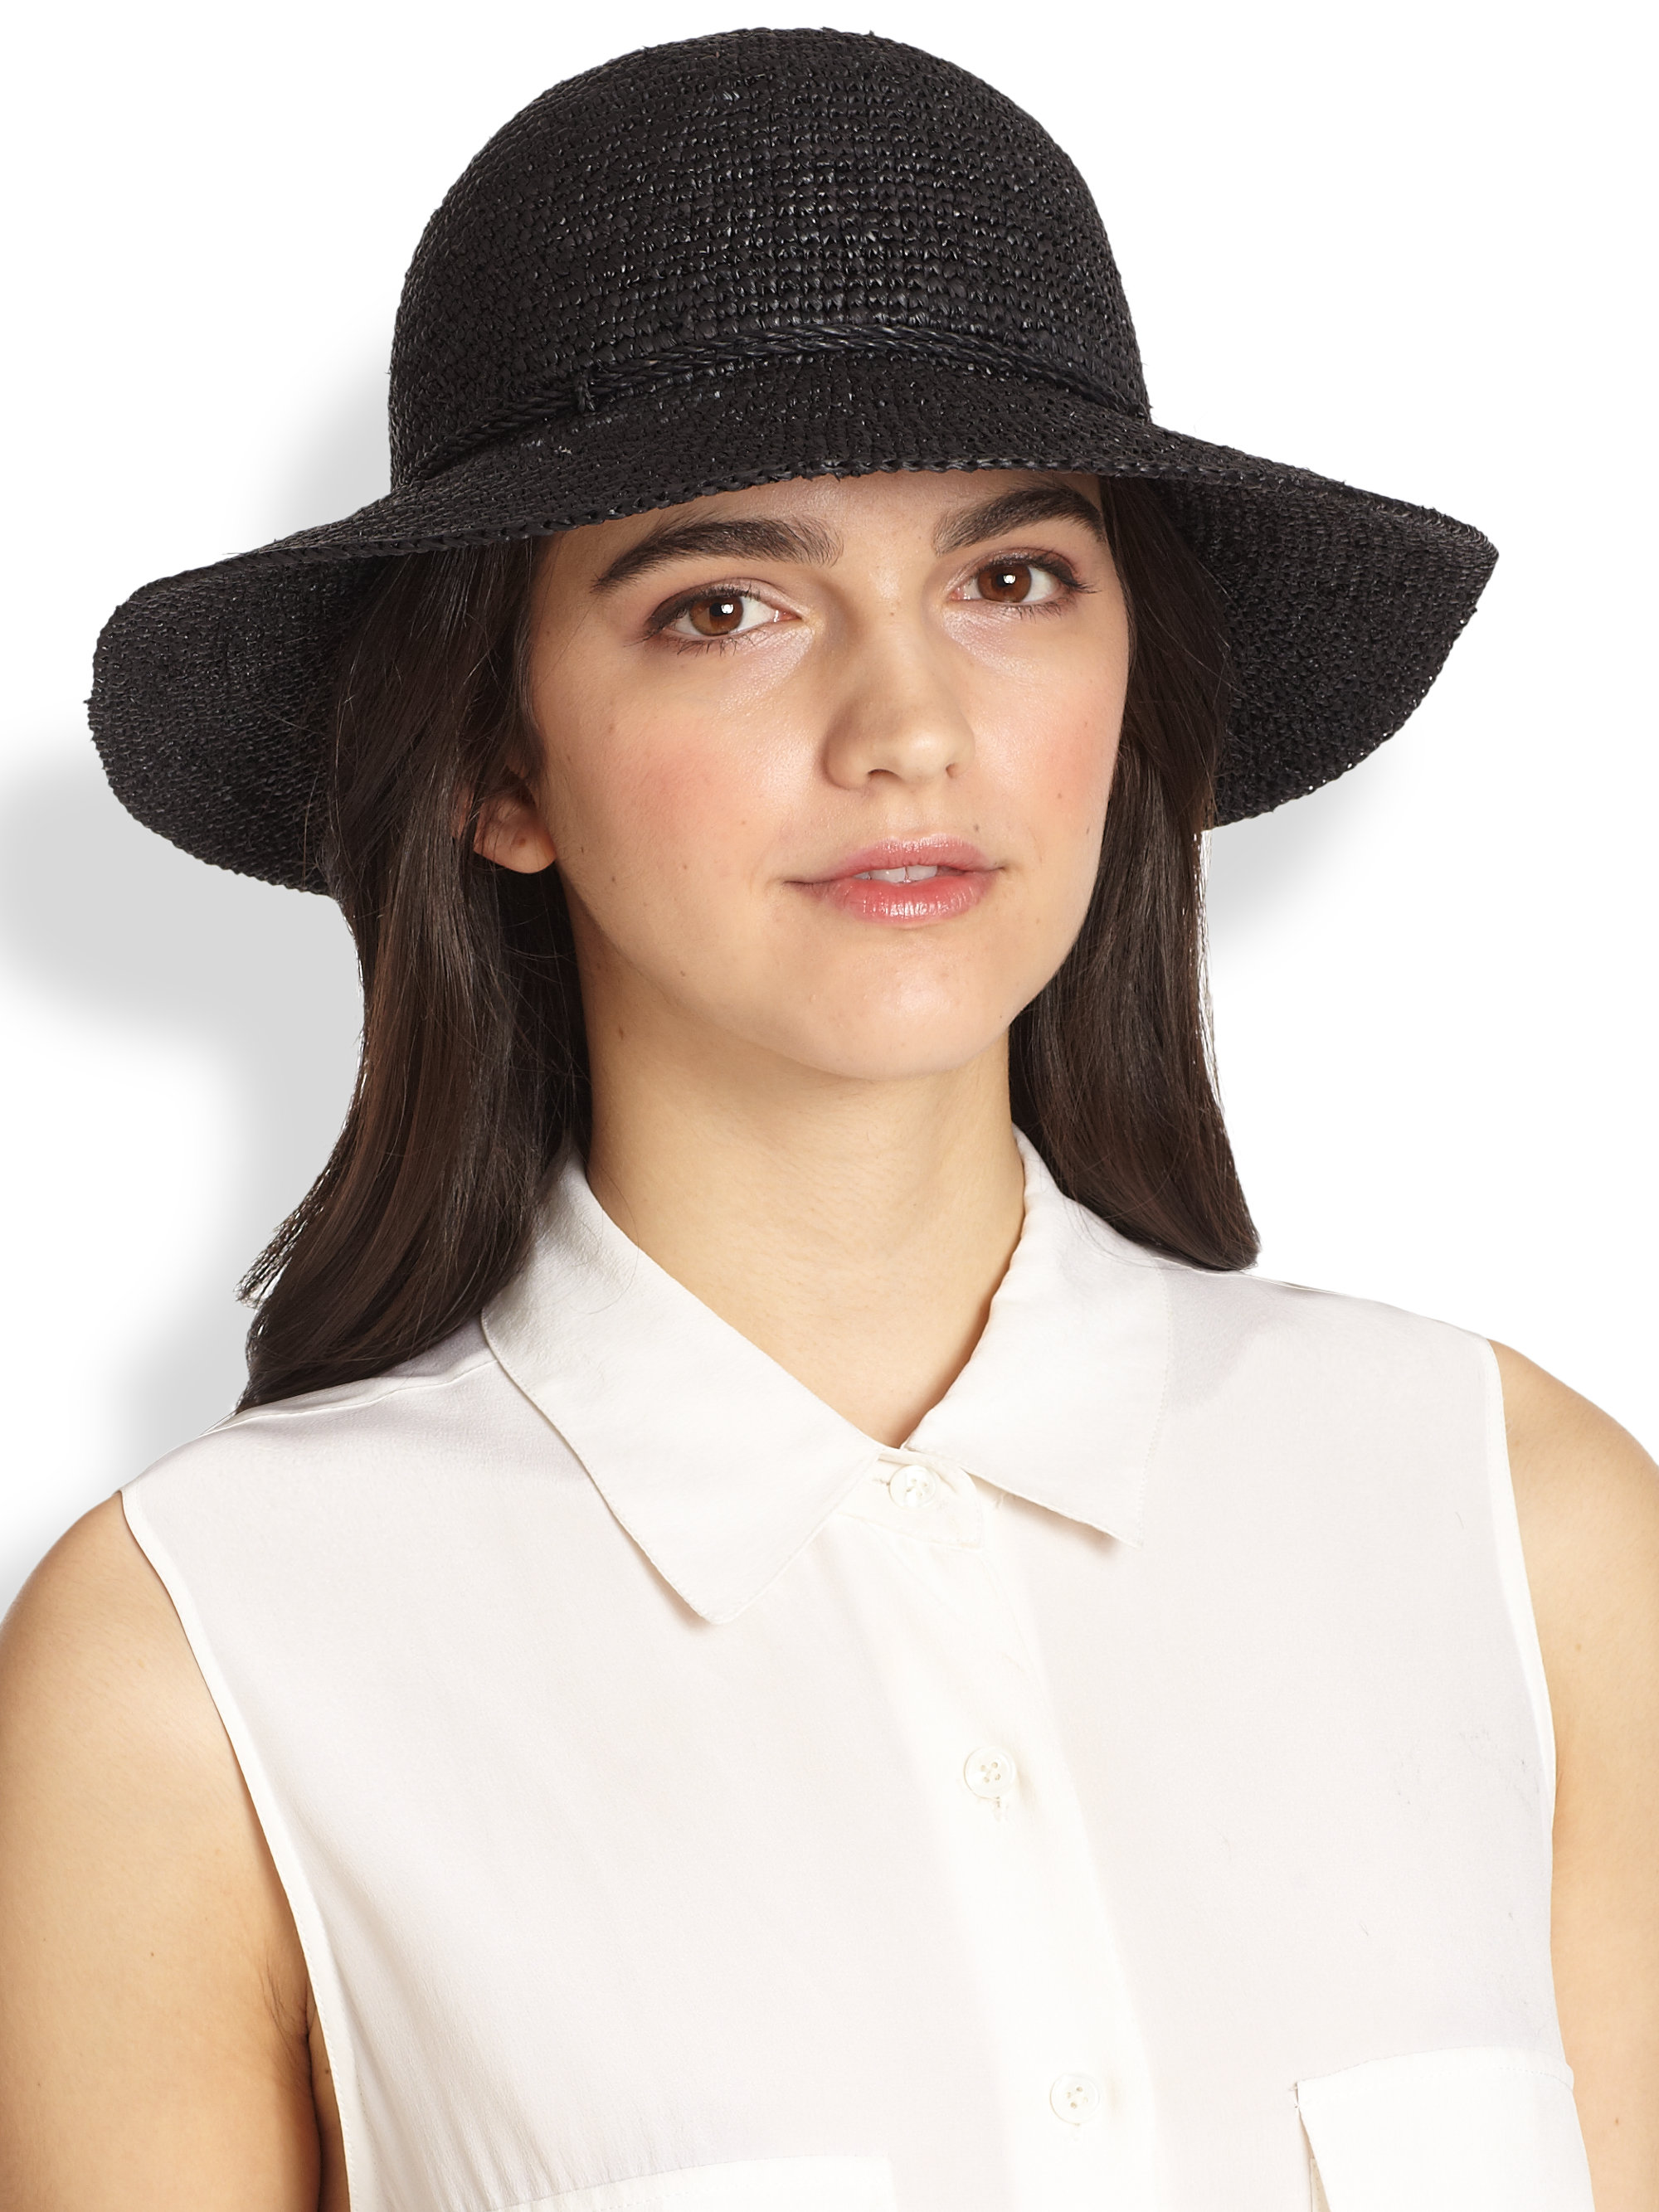 770997cd174baf Helen Kaminski Caicos Raffia Crochet Hat in Black - Lyst